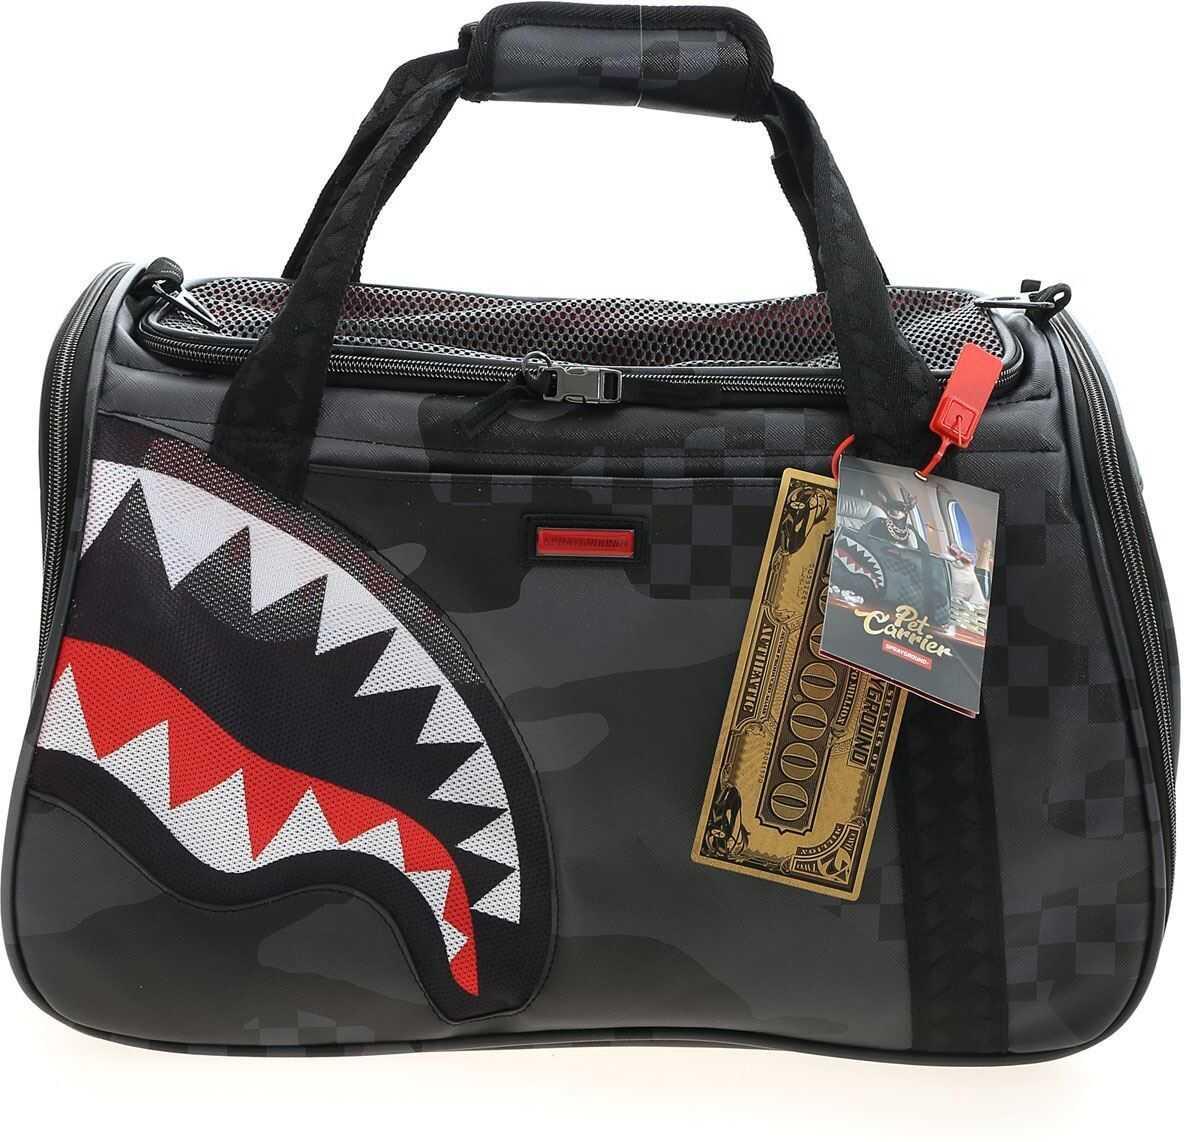 Sprayground 3Am Pet Carrier Bag In Grey And Black 910Z279NSZ Grey imagine b-mall.ro